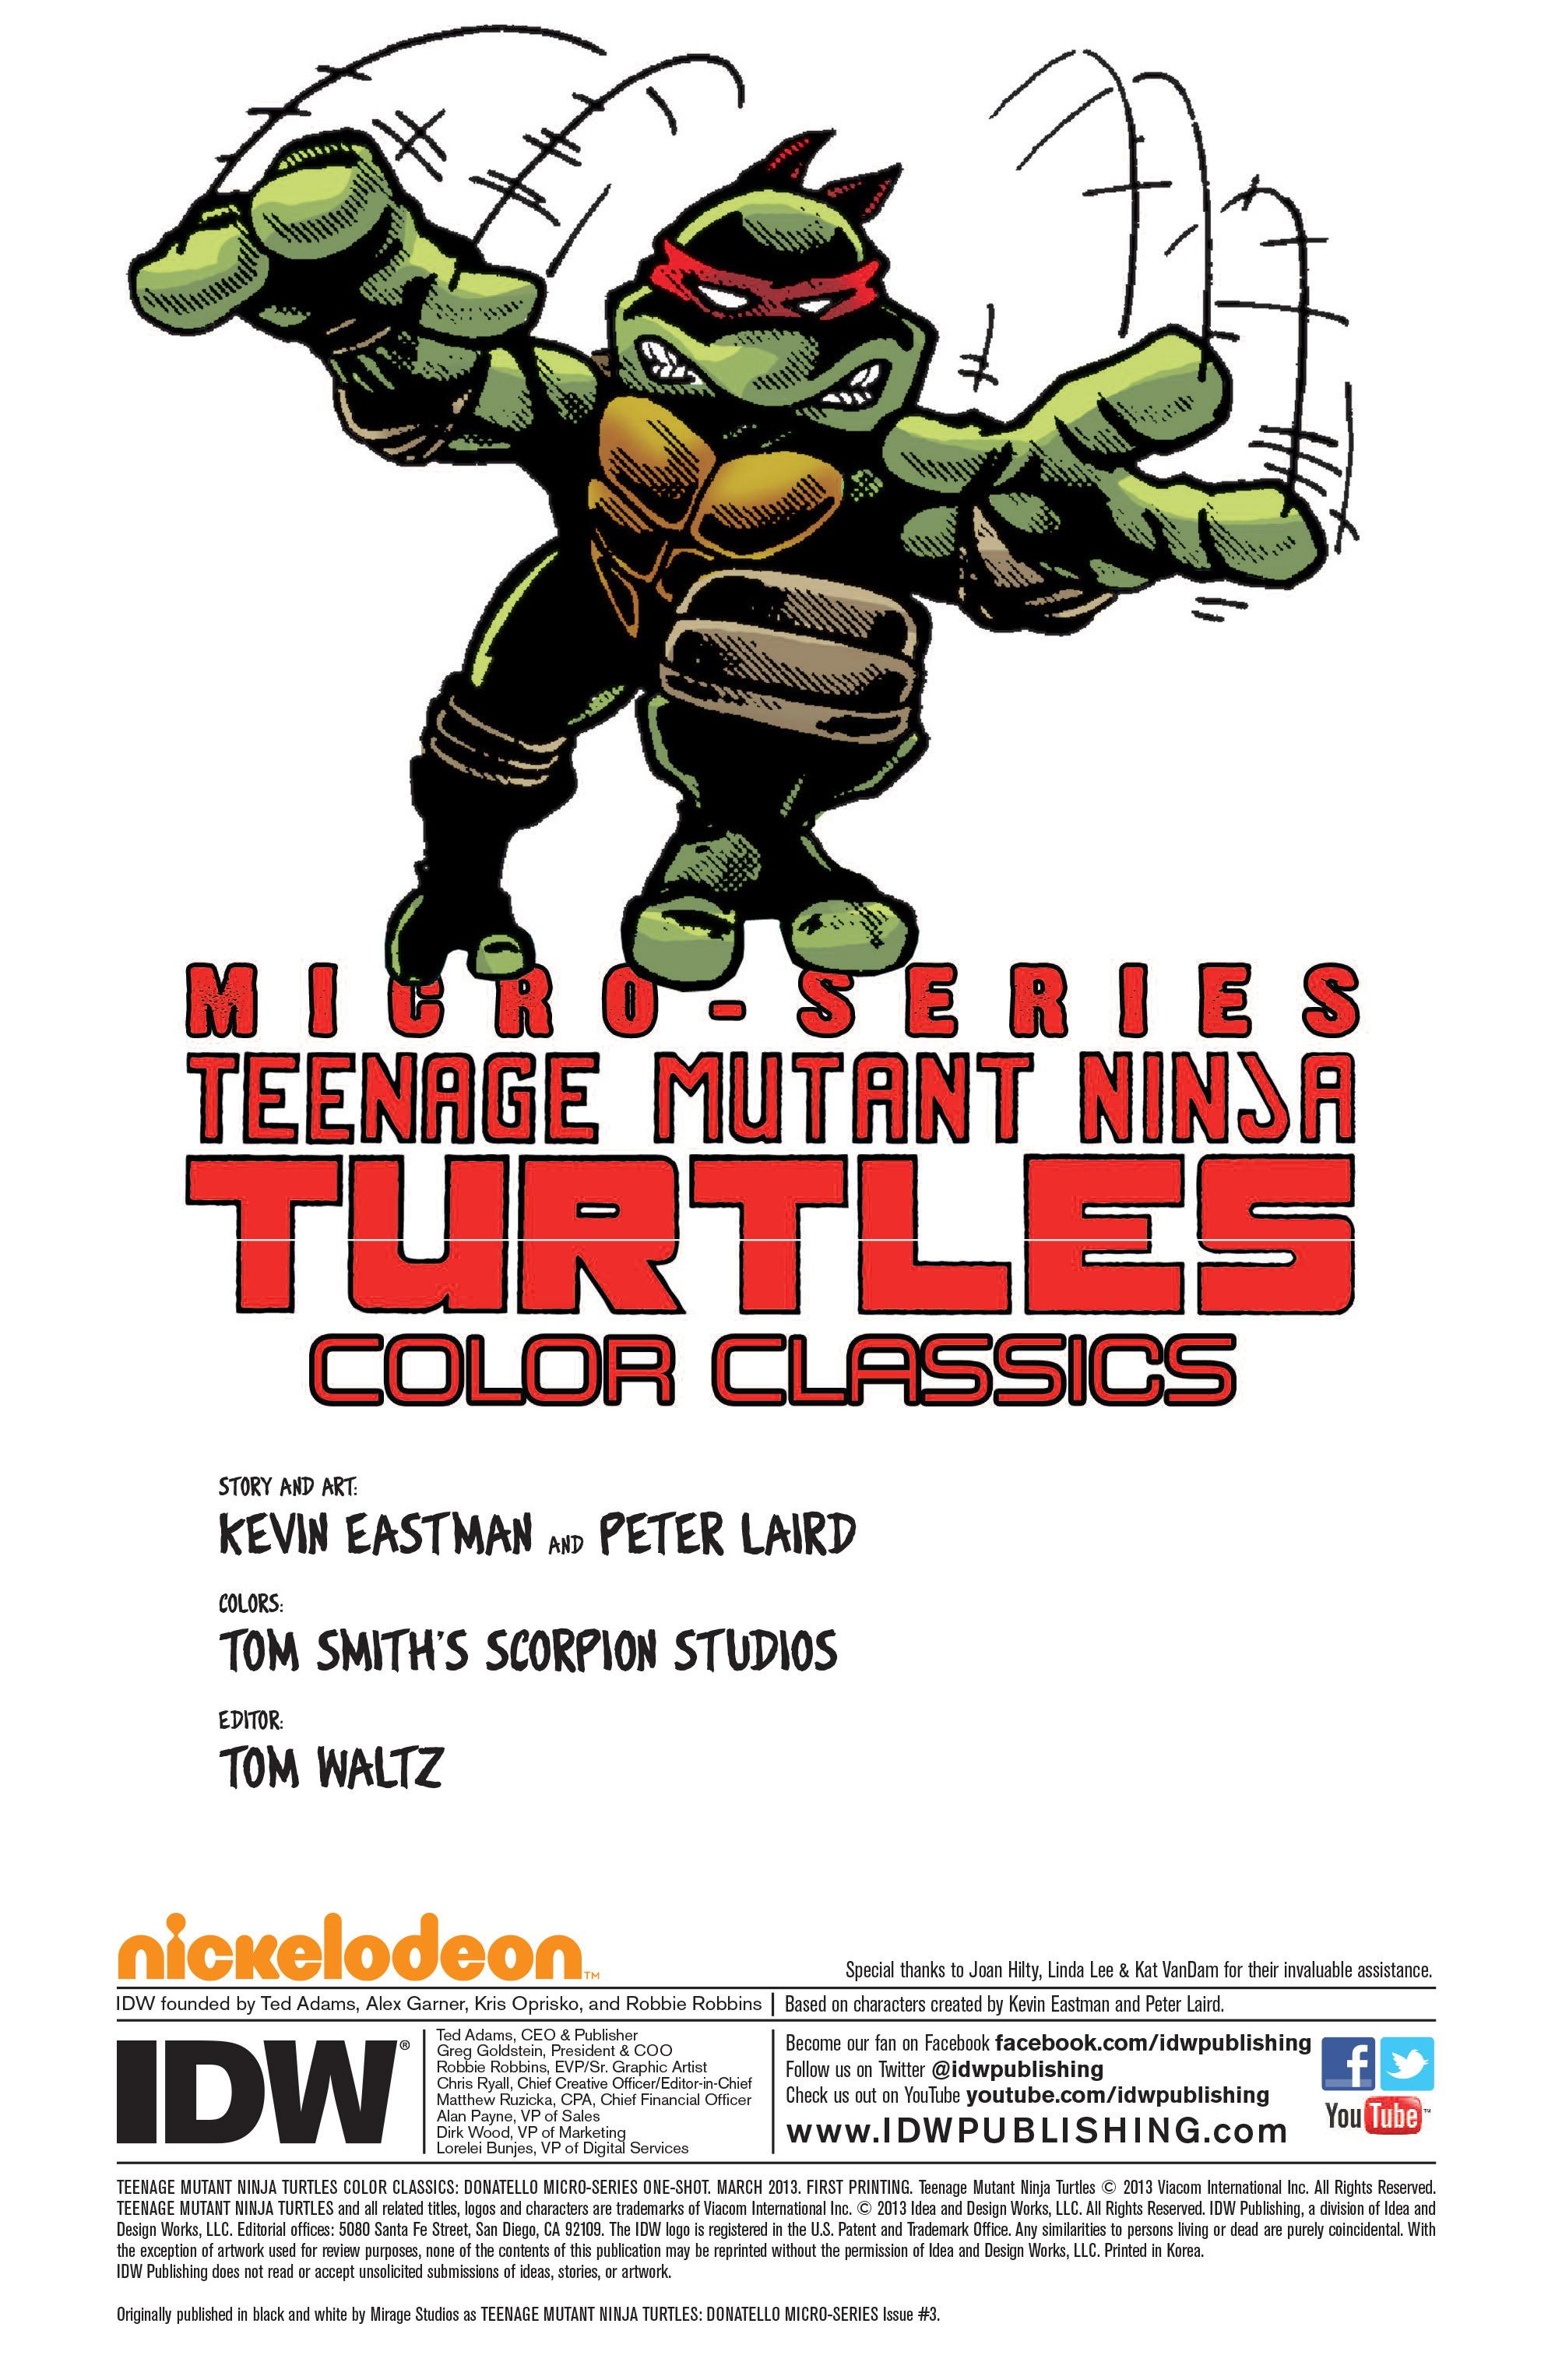 Teenage Mutant Ninja Turtles Color Classics: Donatello Micro-Series